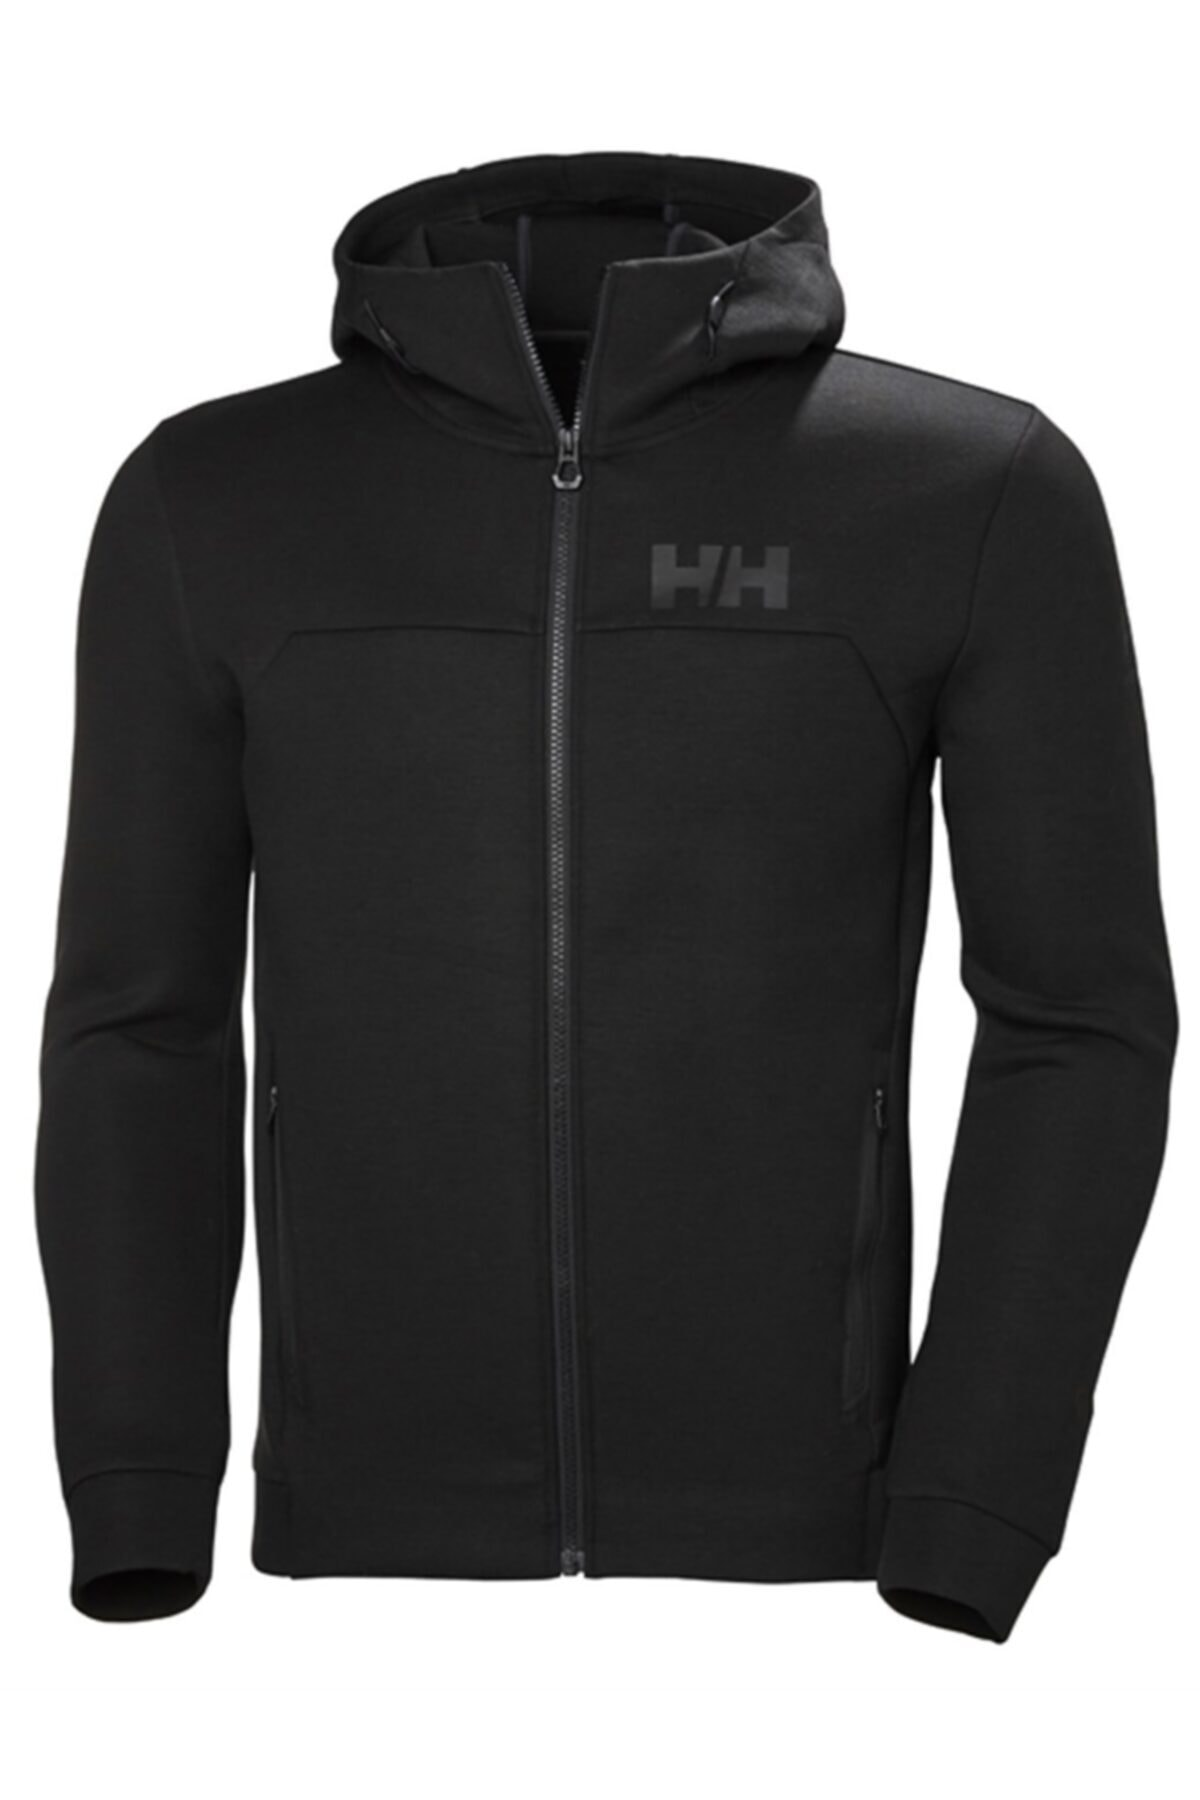 Helly Hansen Erkek Siyah Sweatshirt 1